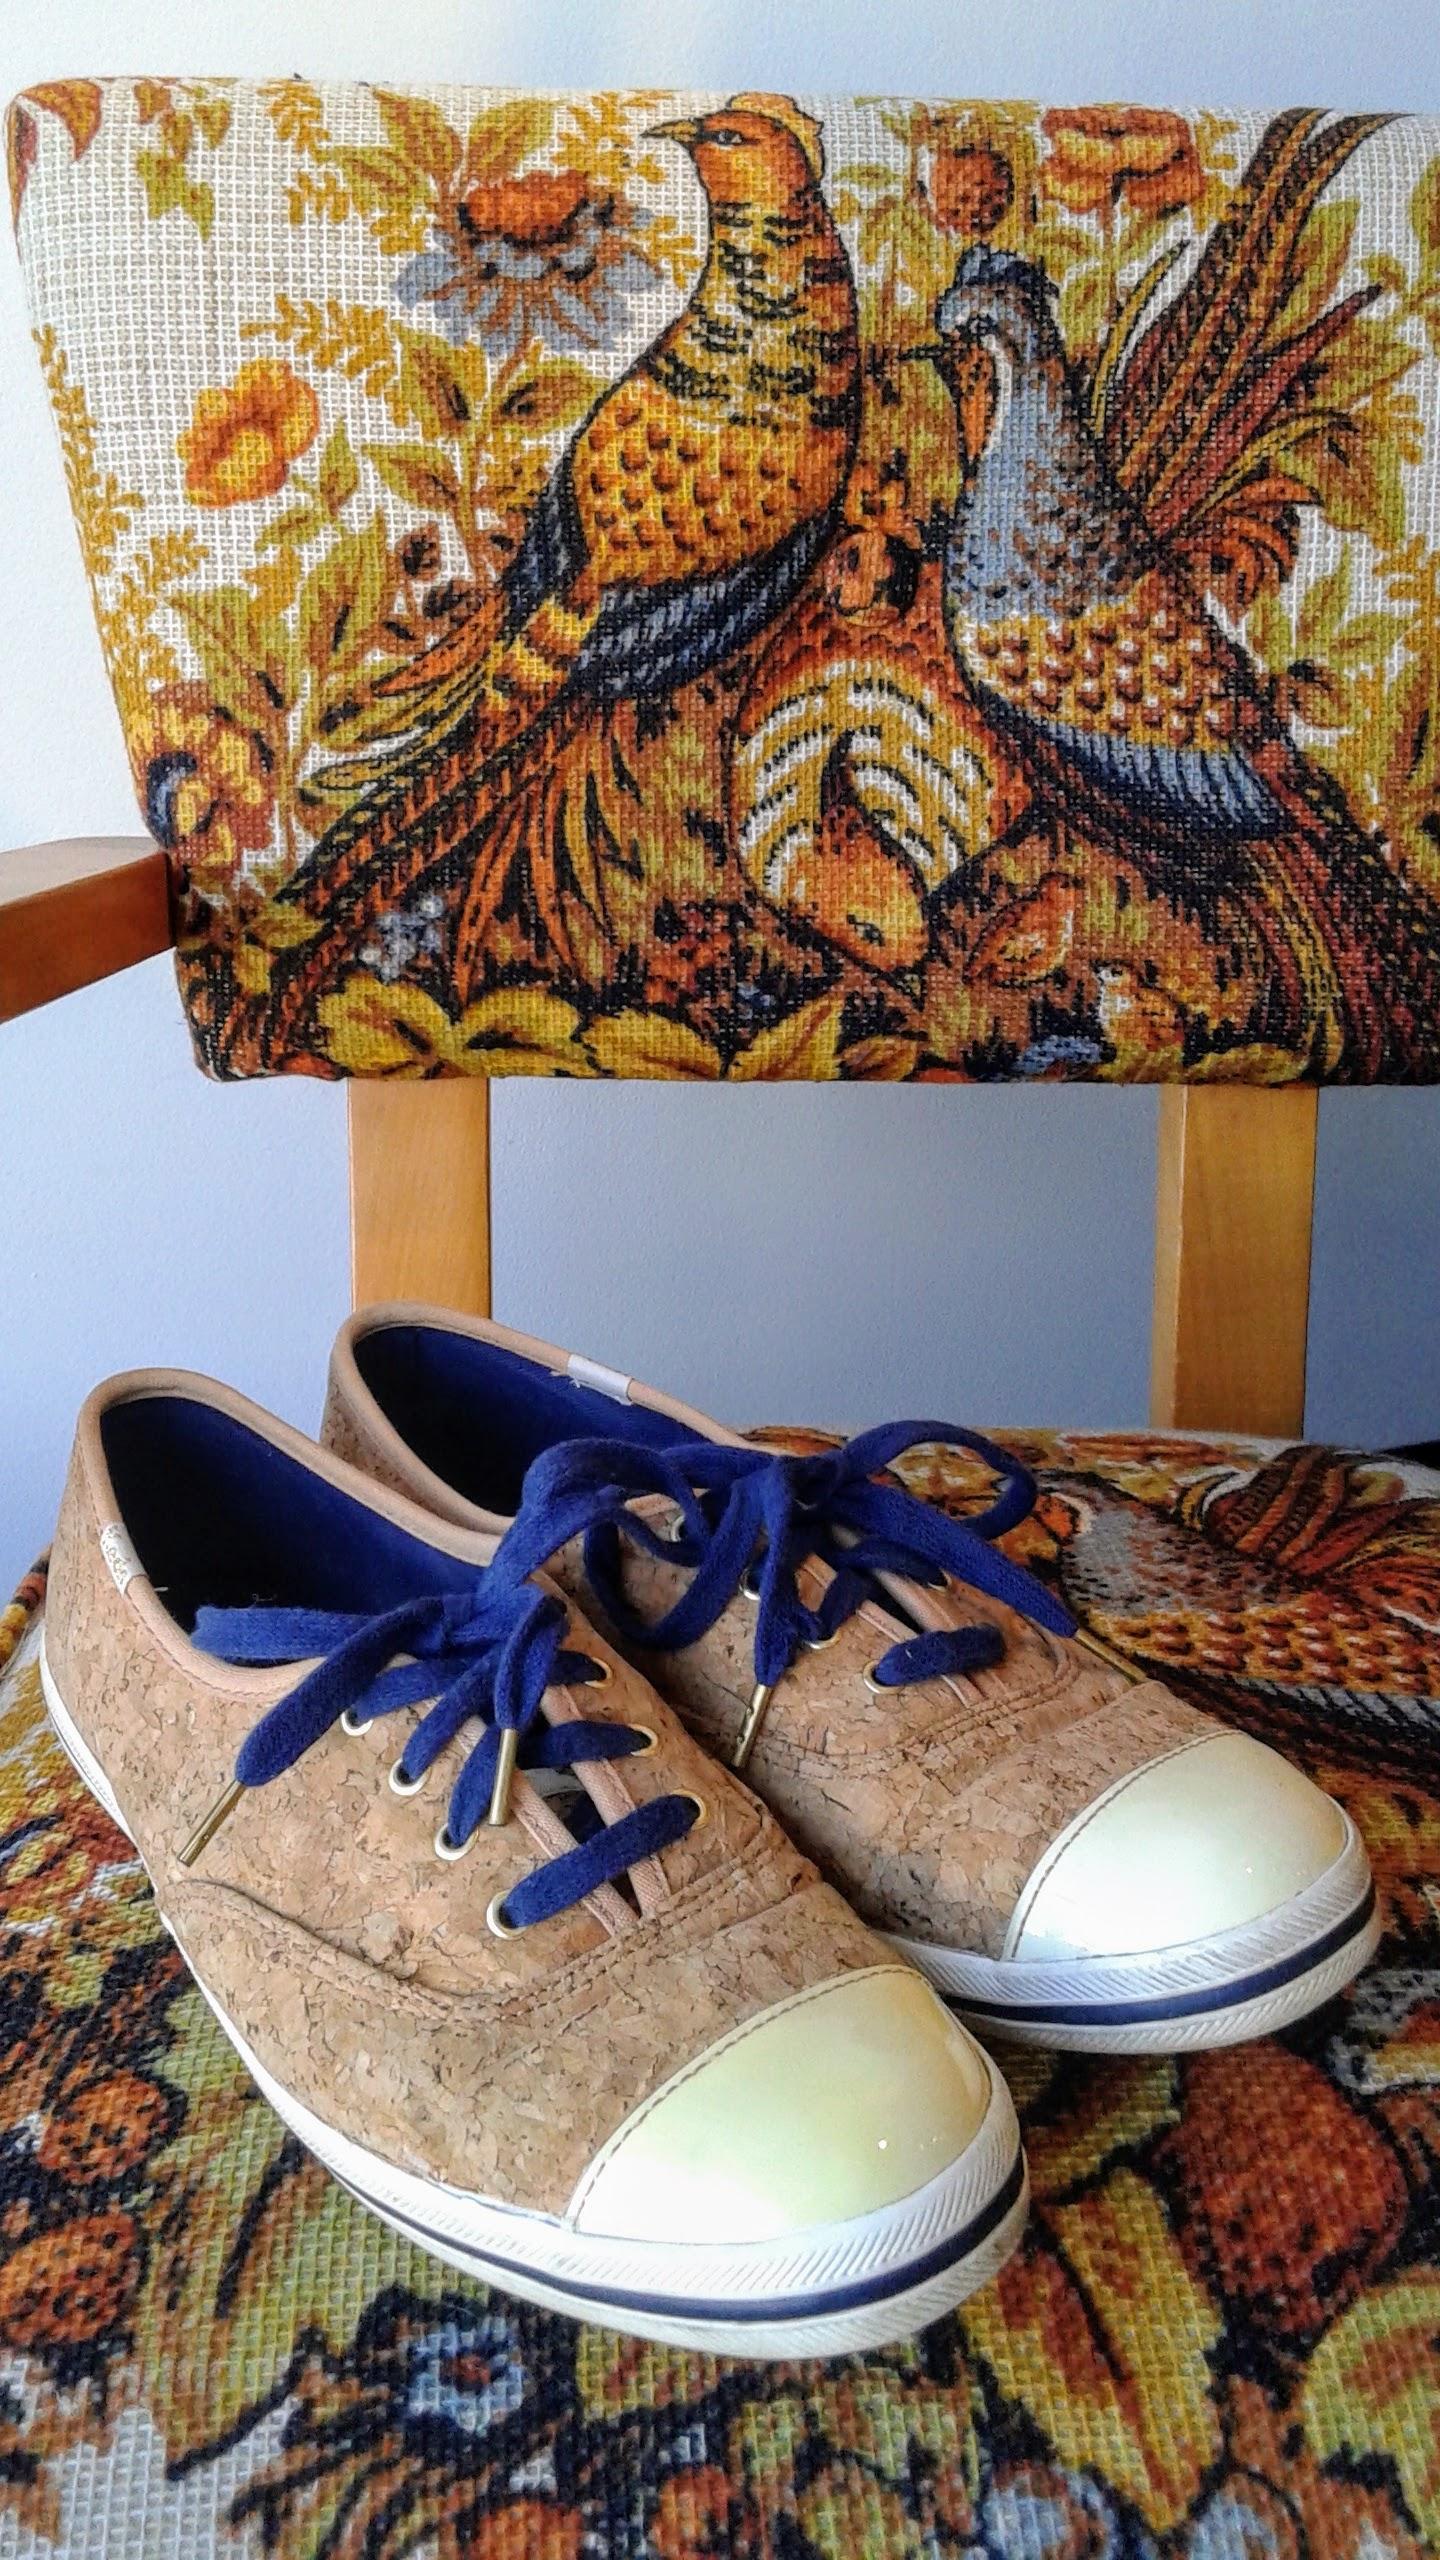 Keds X Kate Spade shoes; S7, $28